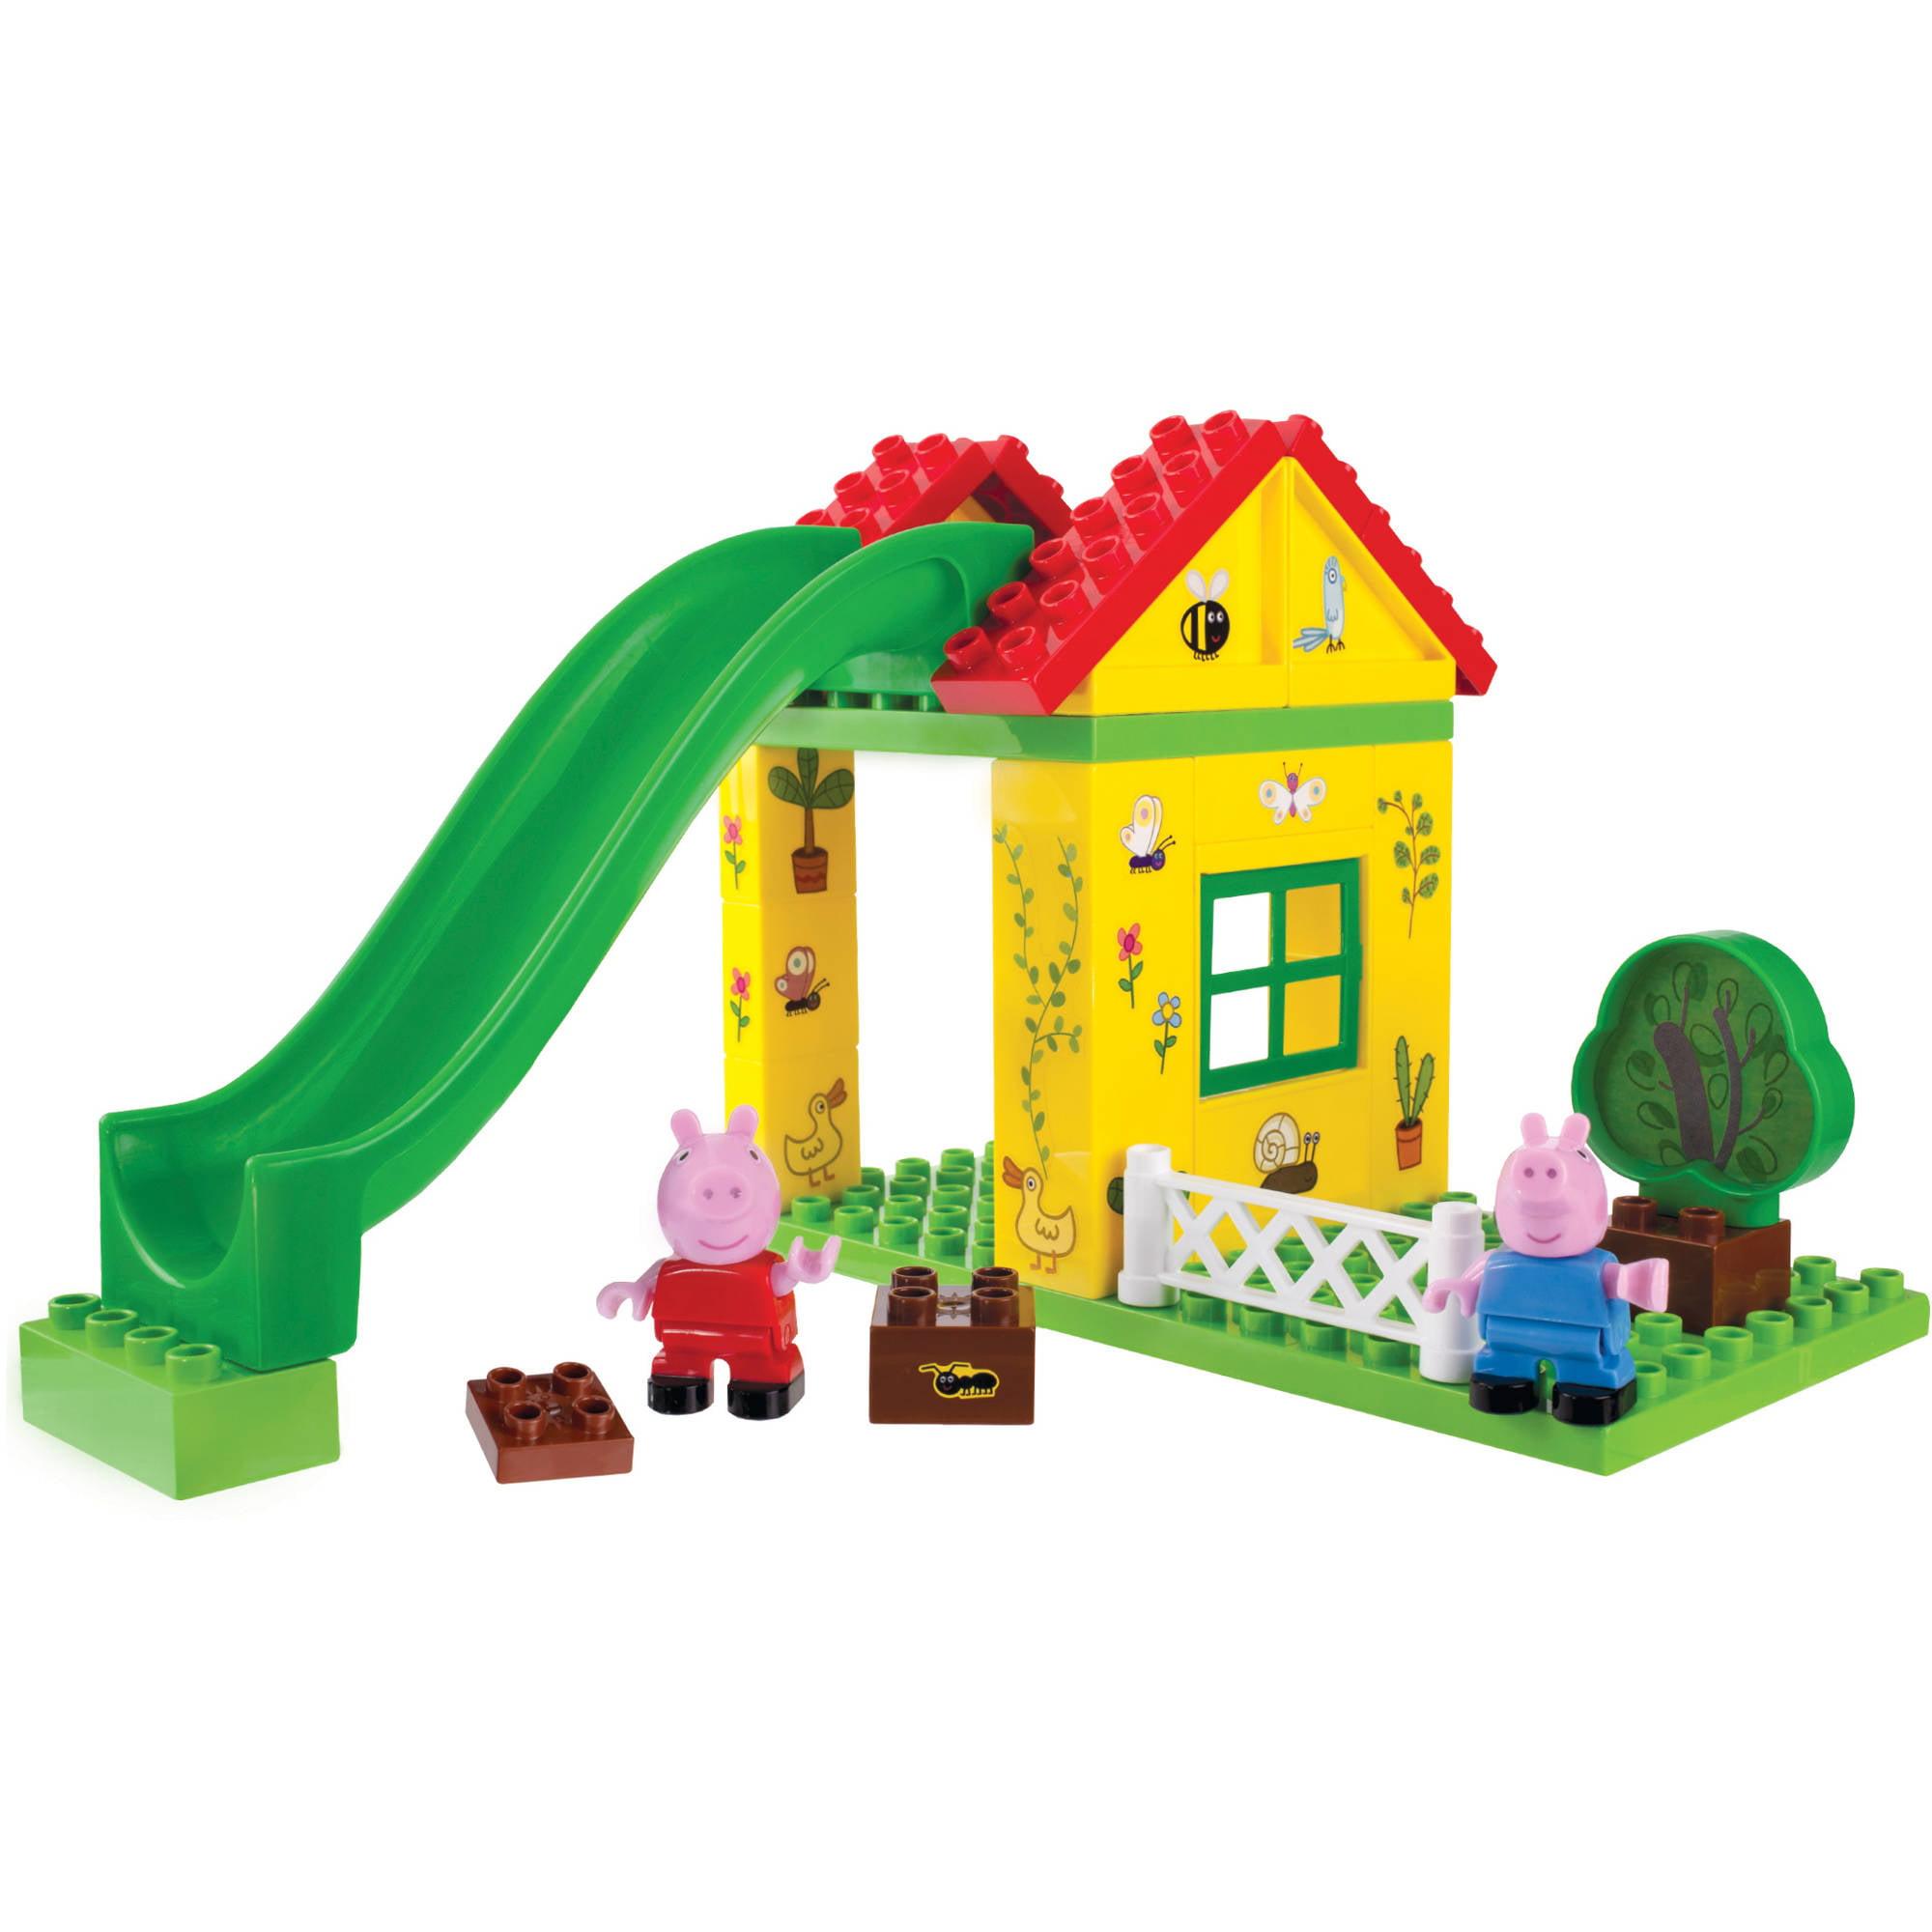 Peppa Pig School House Construction Set Age 3+